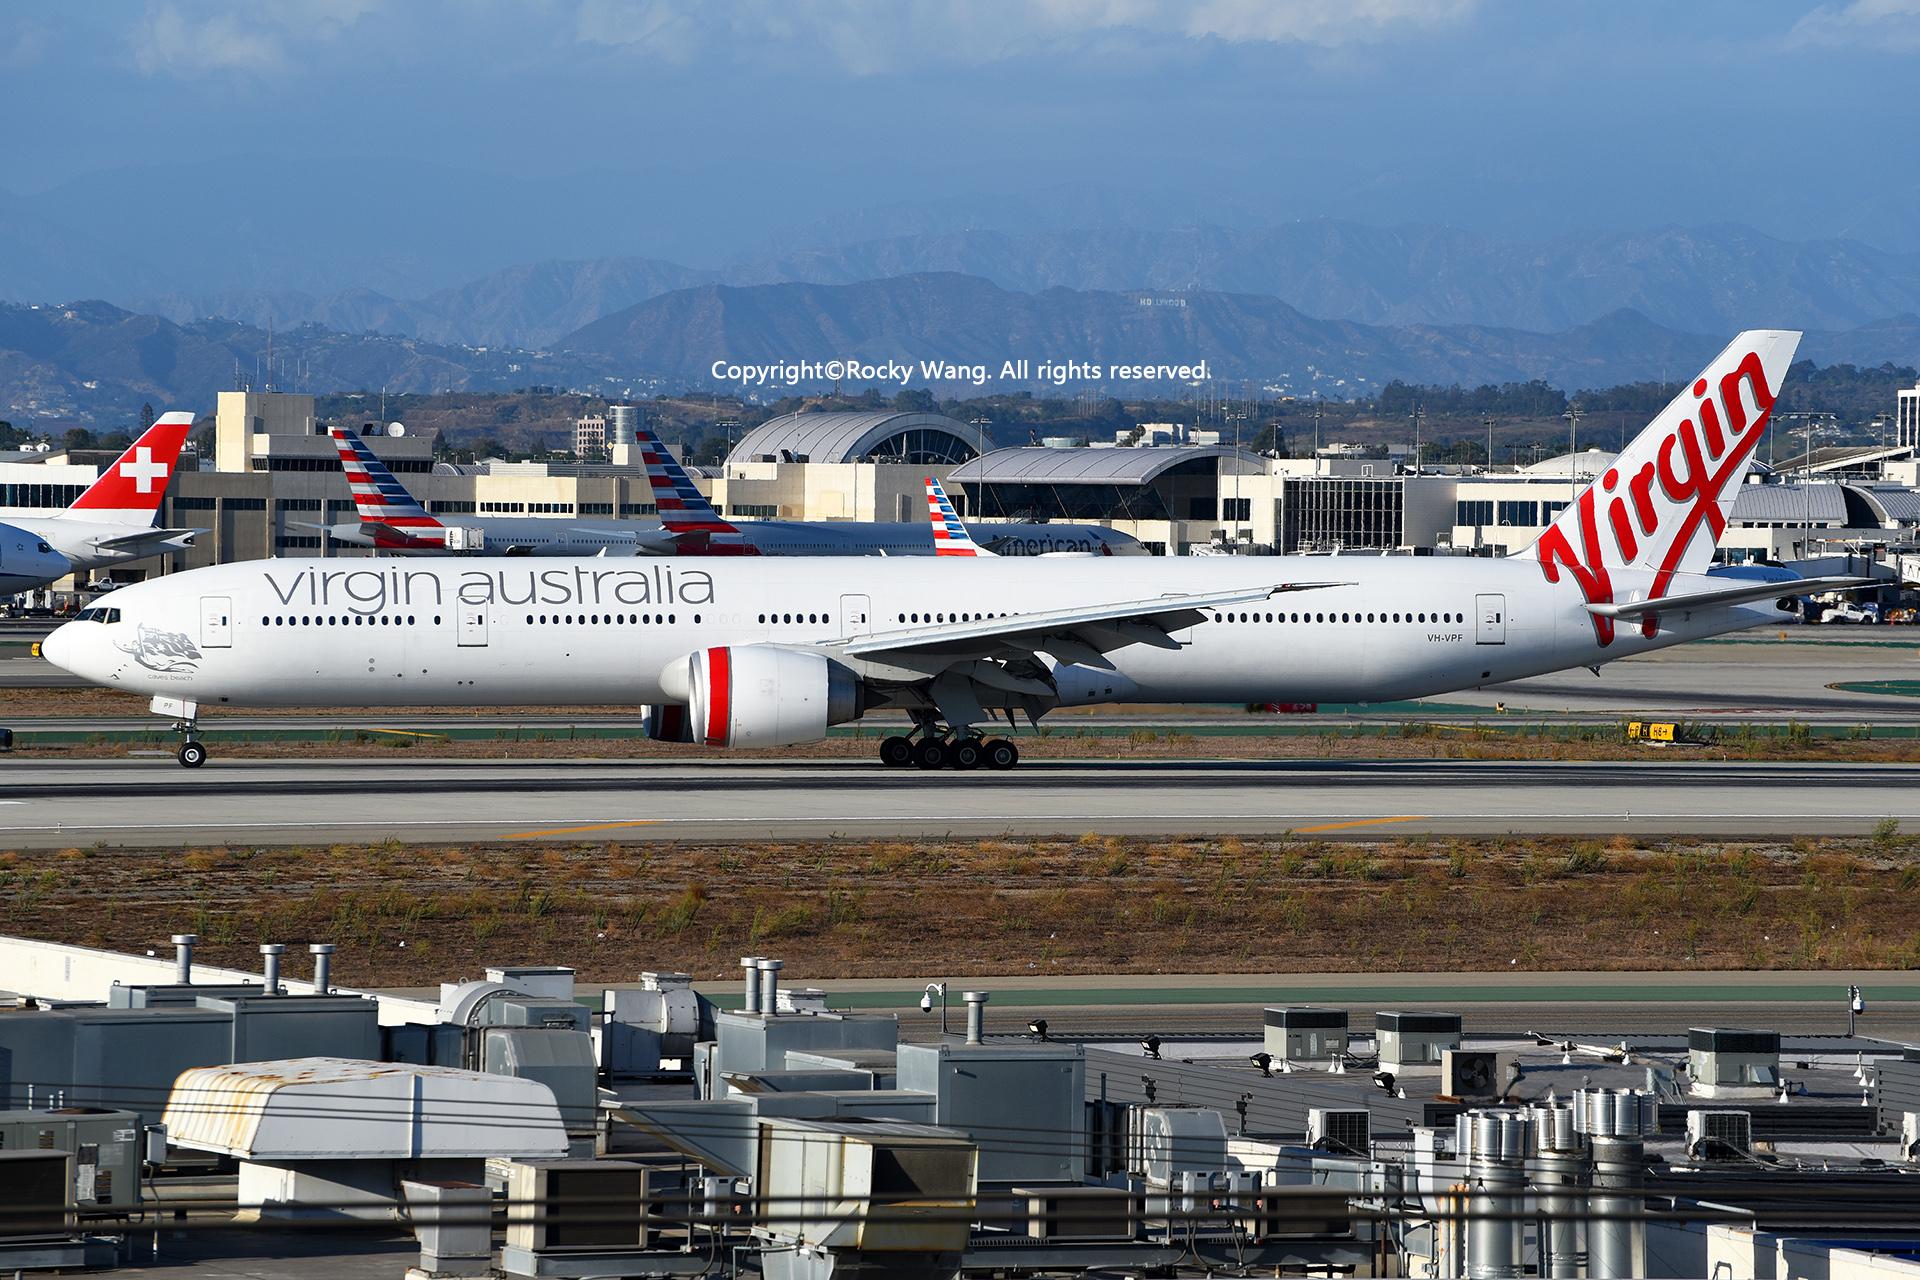 Re:[原创]居家了 批量处理老图 倾情奉献52家777 BOEING 777-3ZGER VH-VPF Los Angeles Int'l Airport